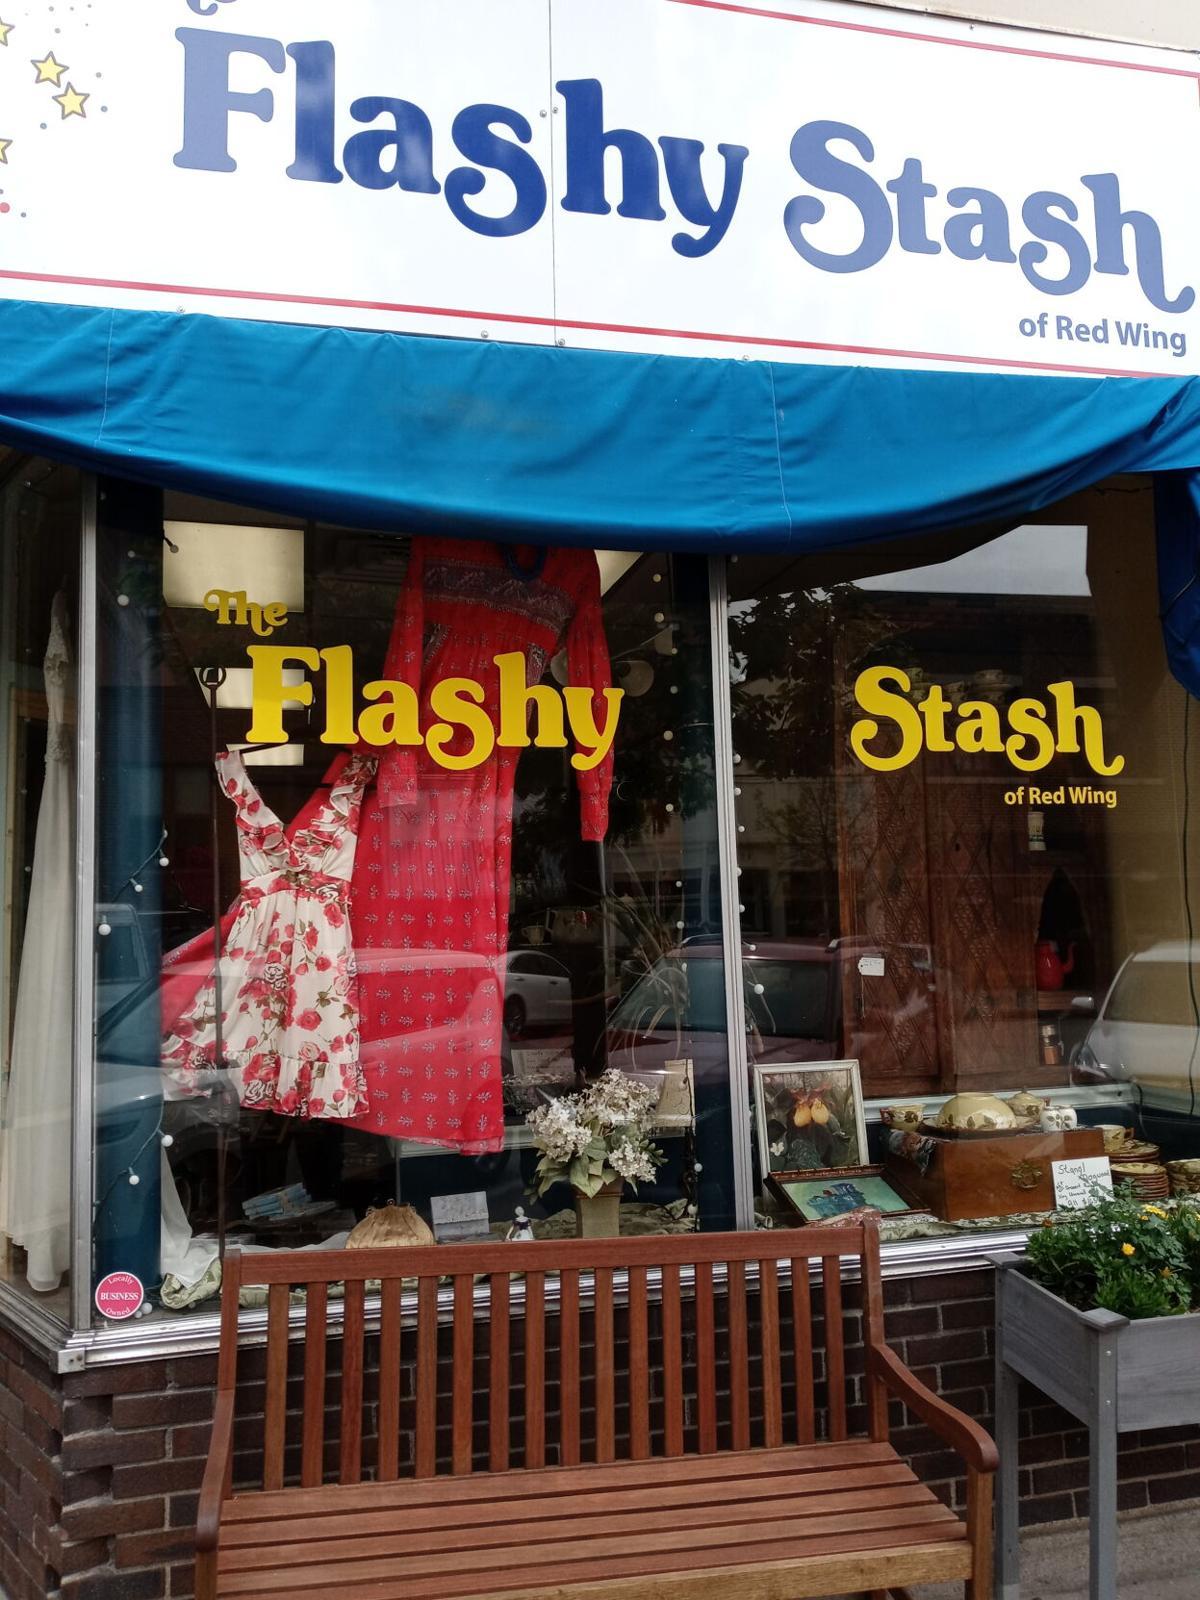 Flashy Stash